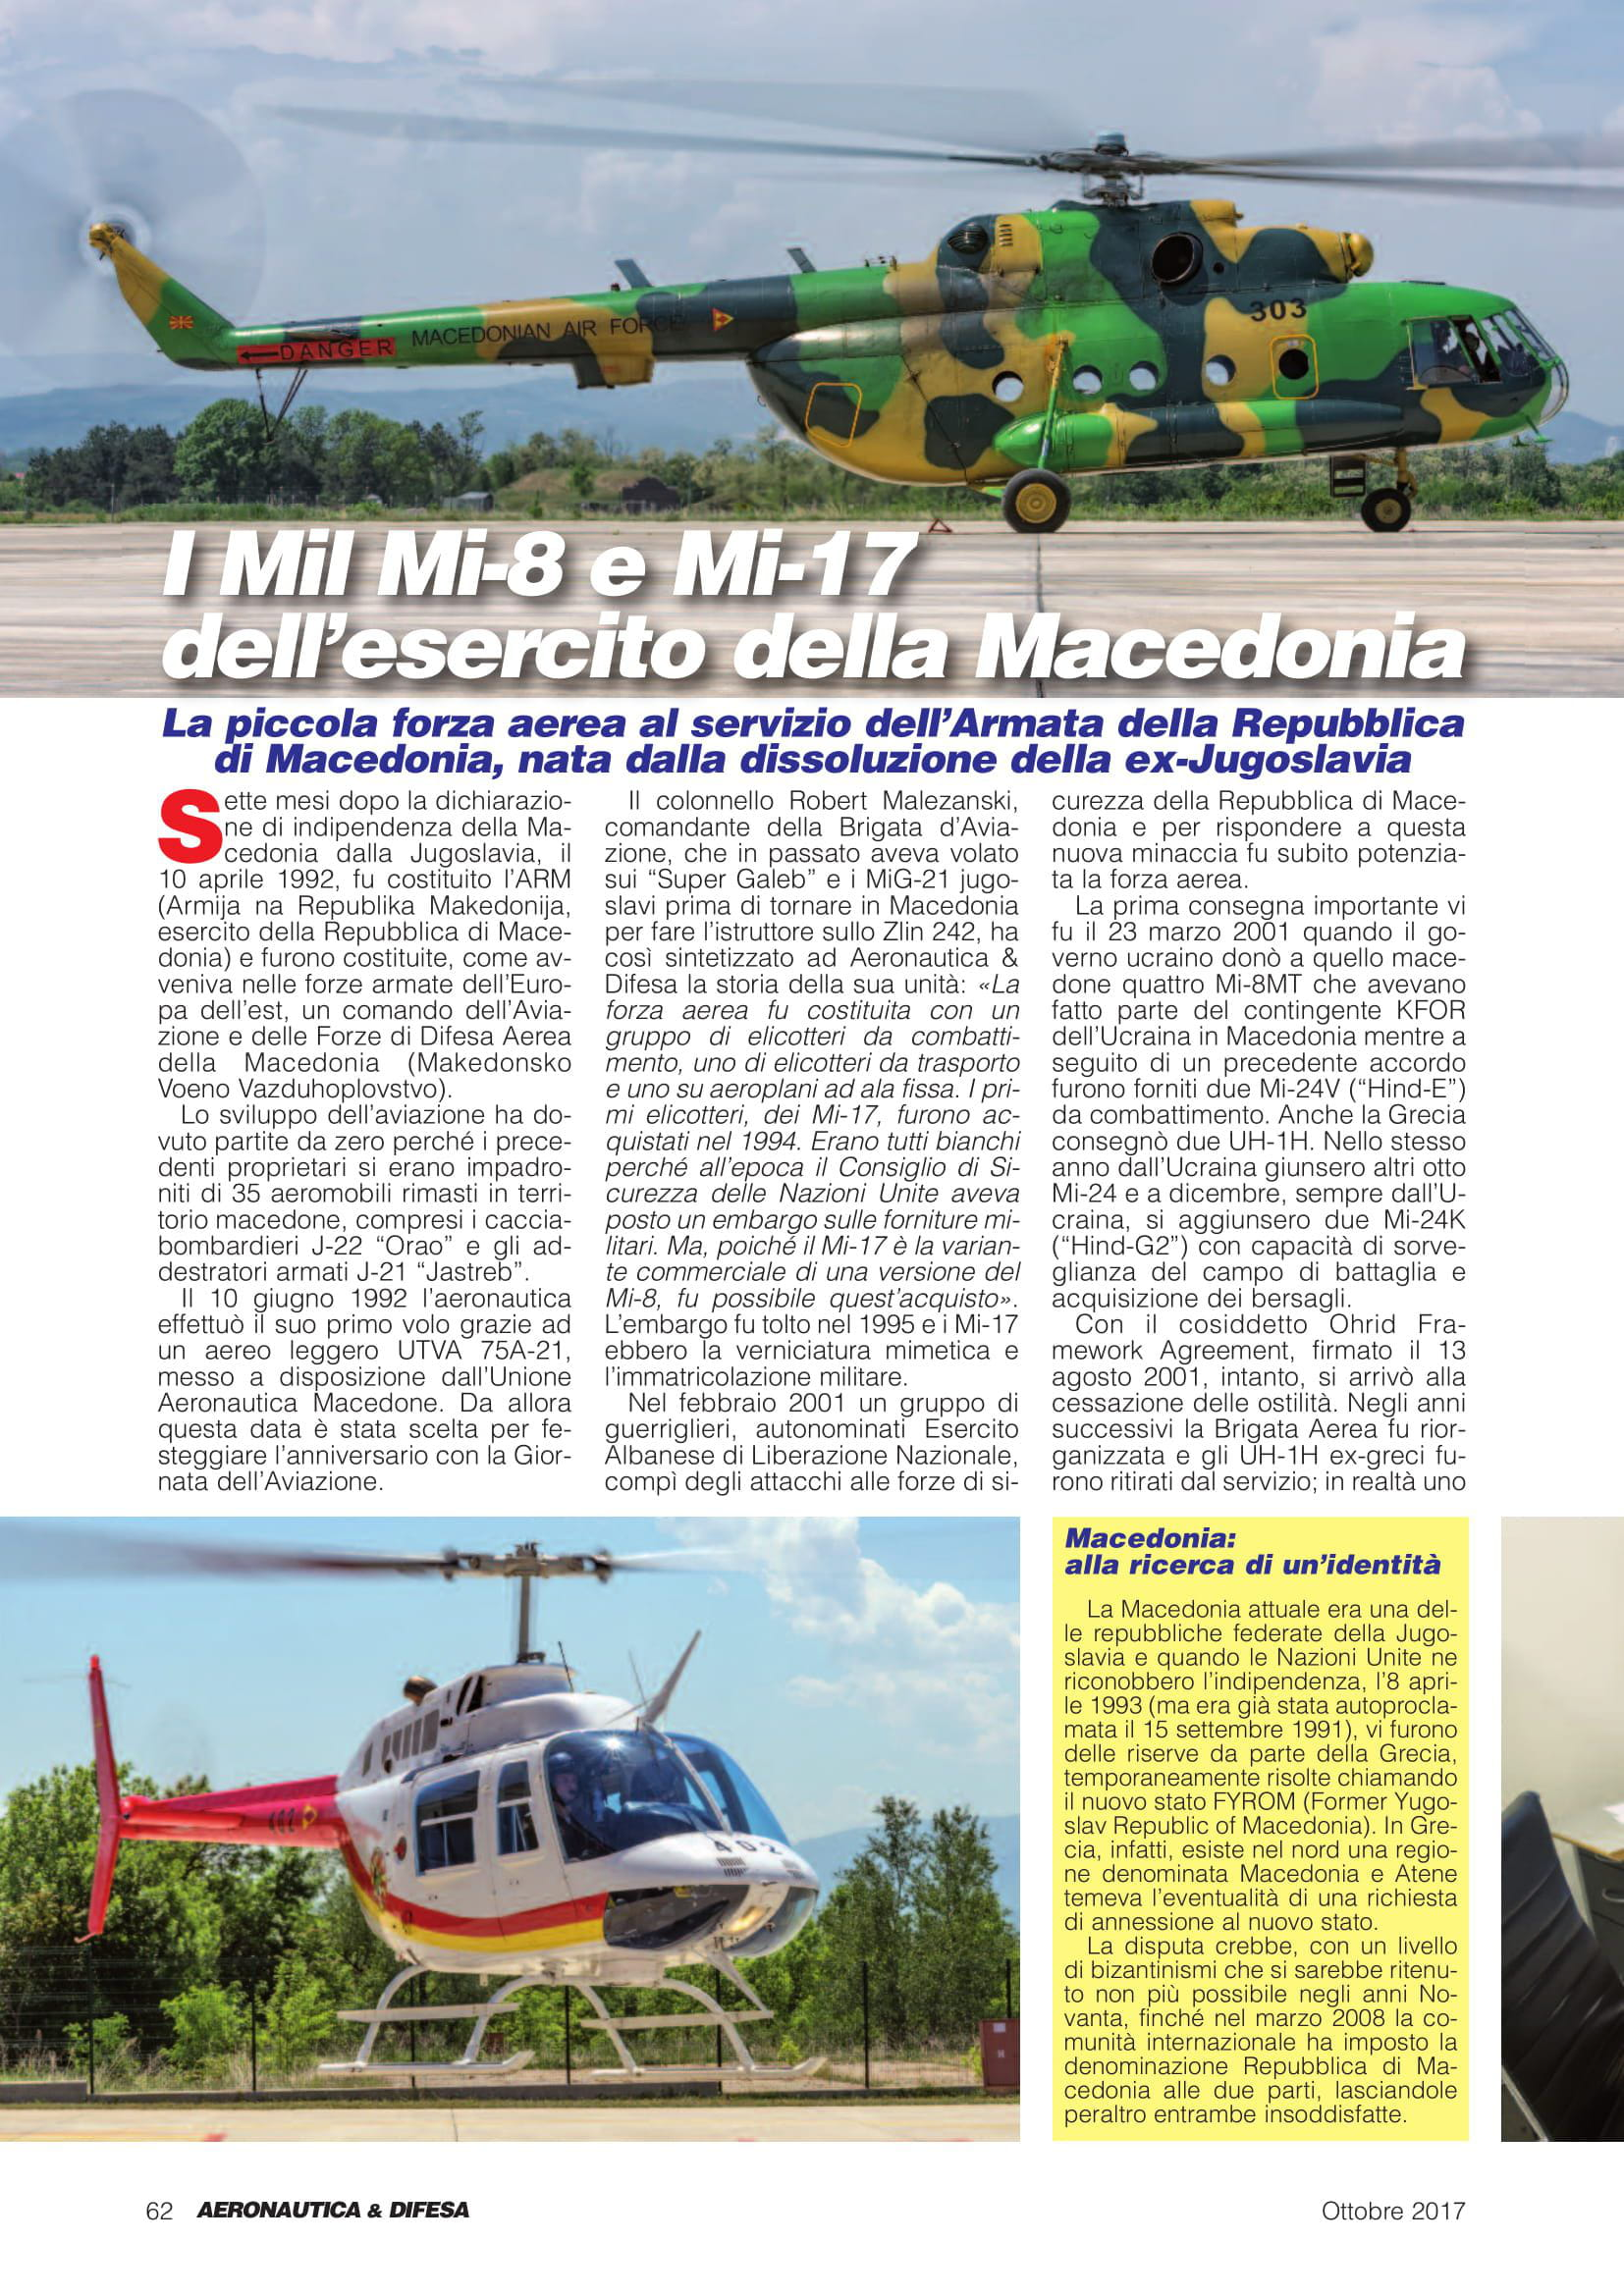 Aeronautica & Difesa (Italy)_Macedonian Air Force-2